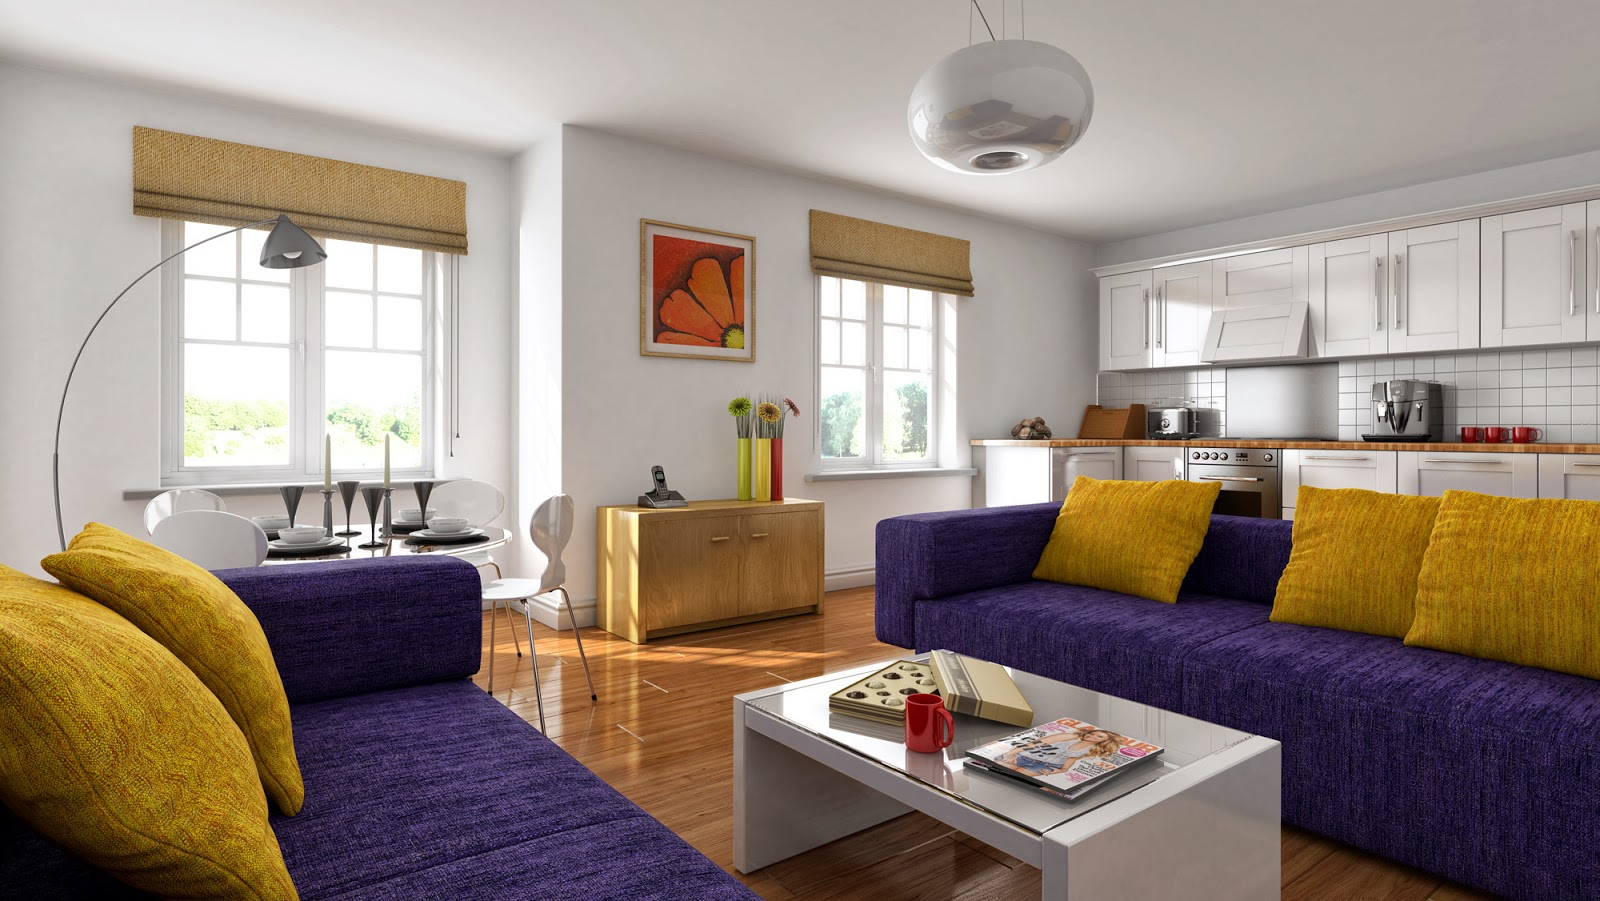 Gambar Design Interior Rumah Minimalis 11